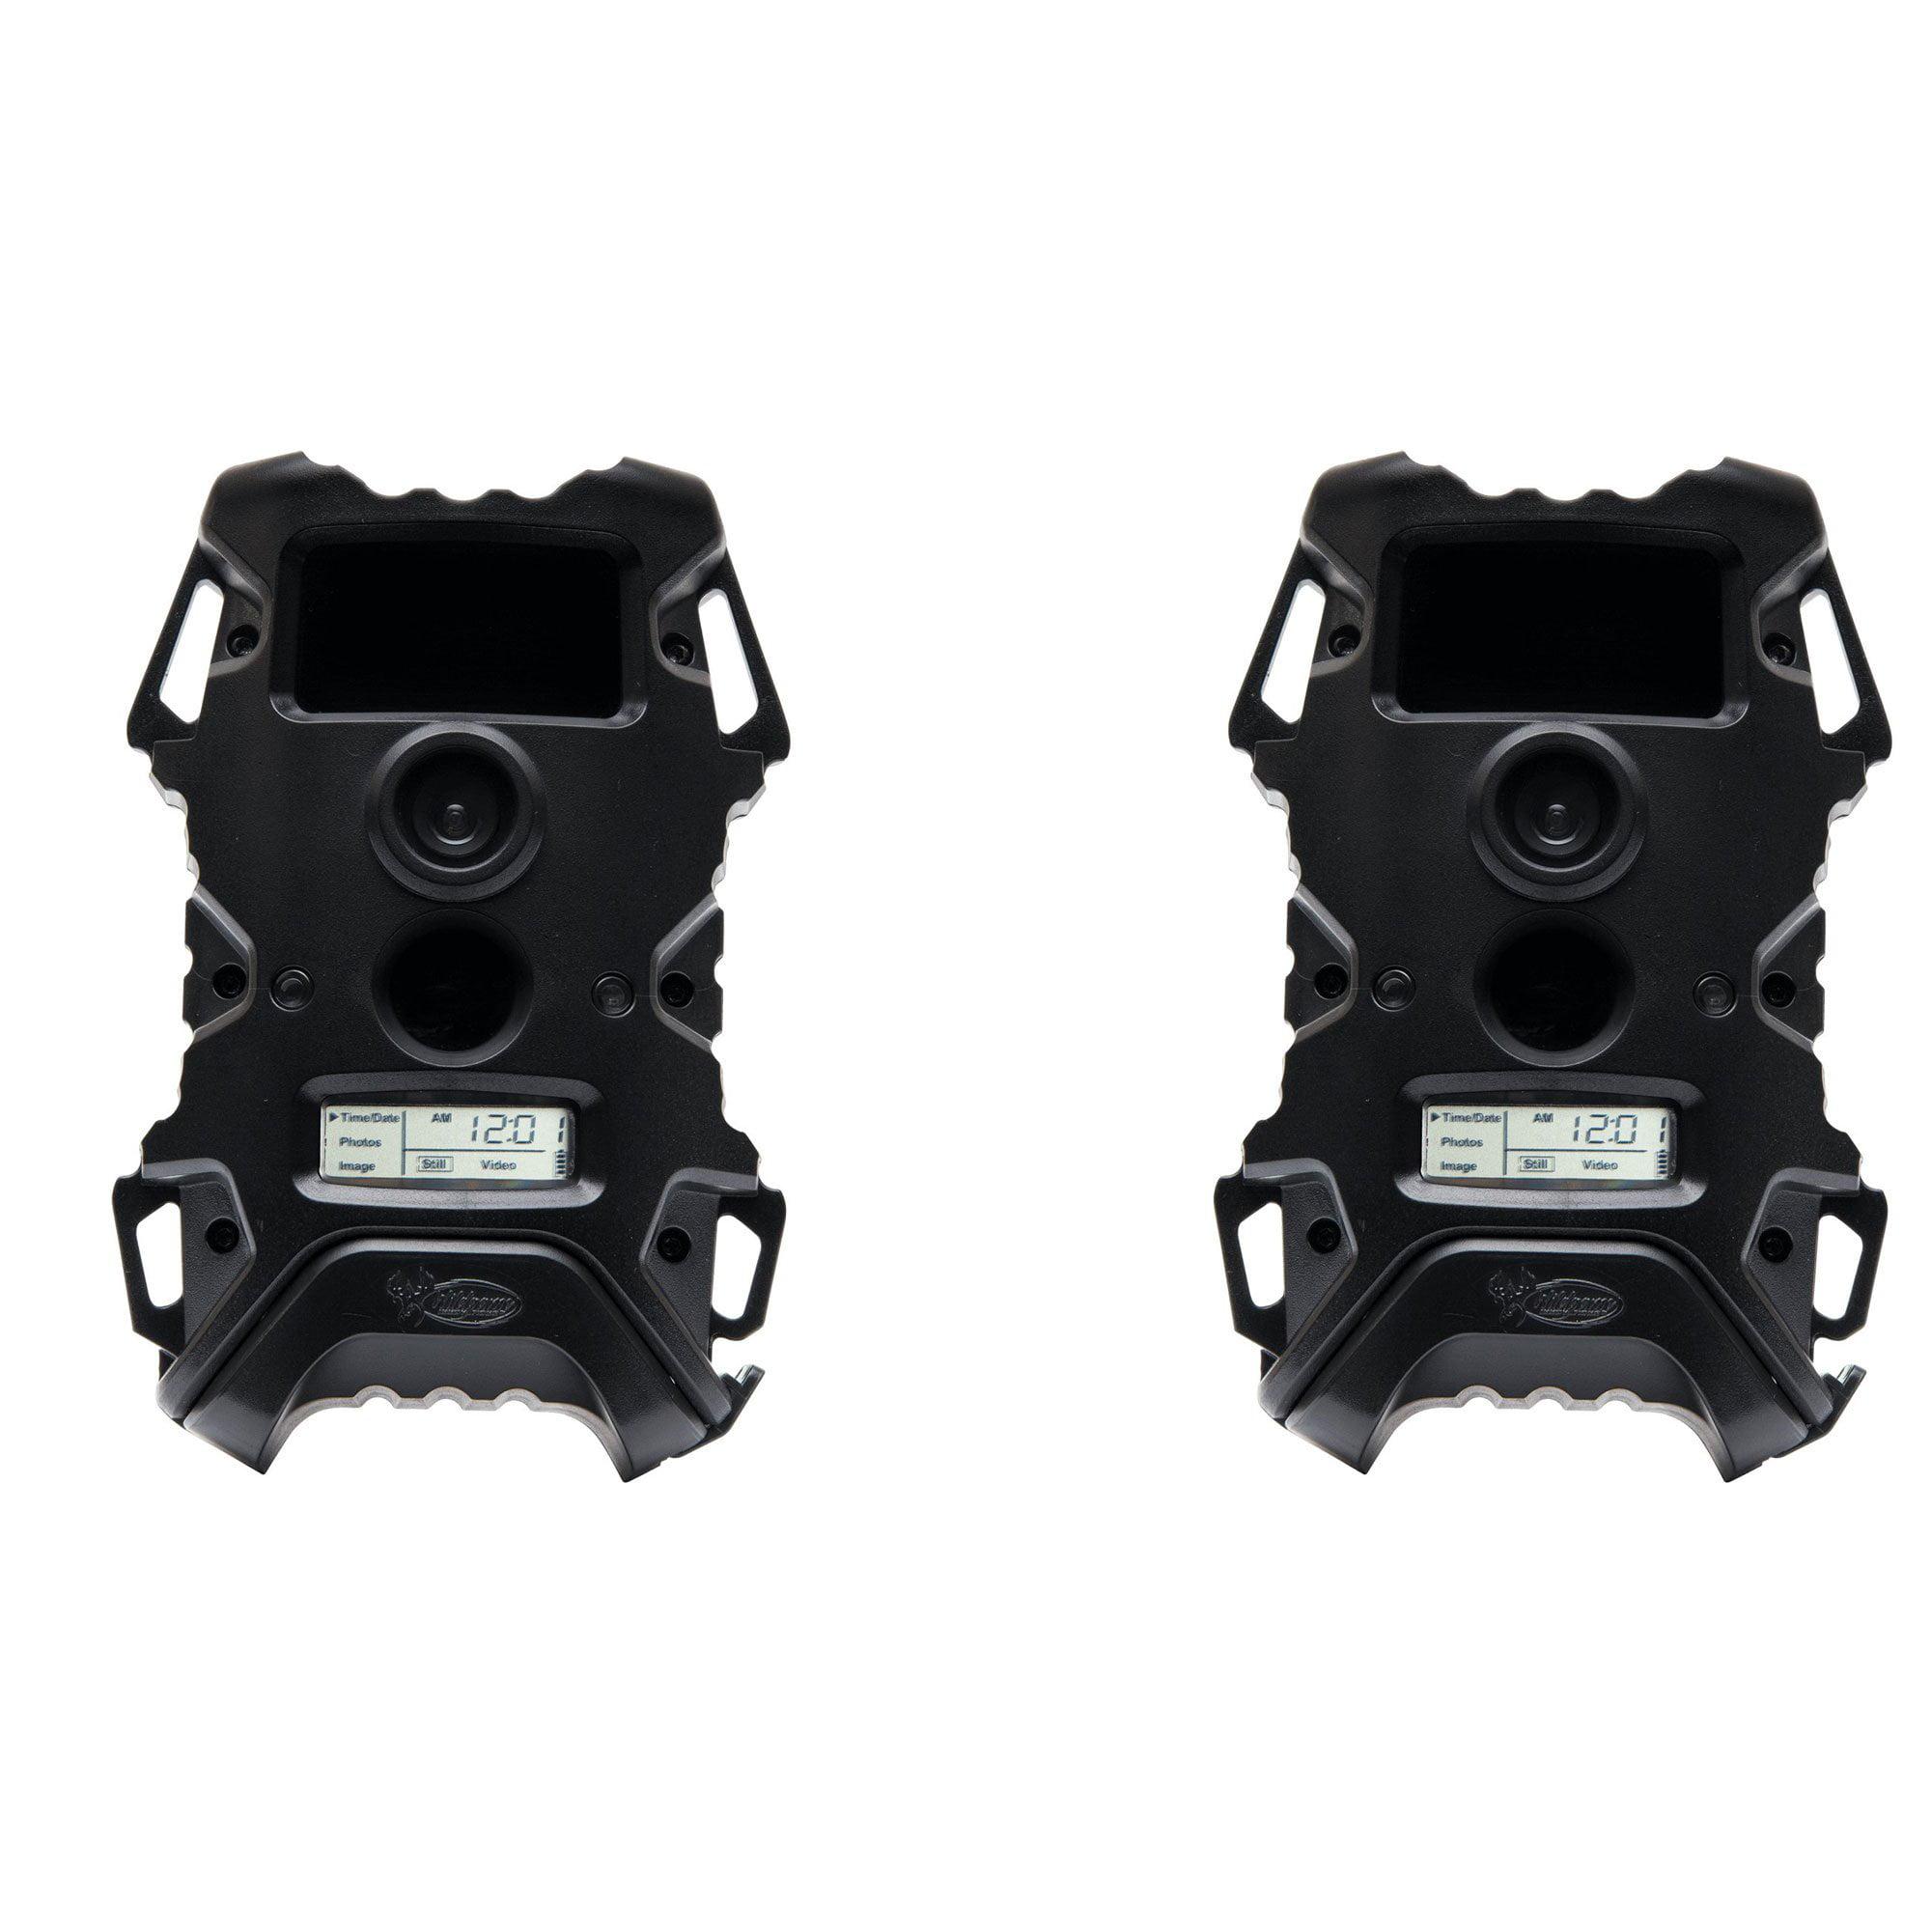 Terra 12 Extreme Blackout Camera